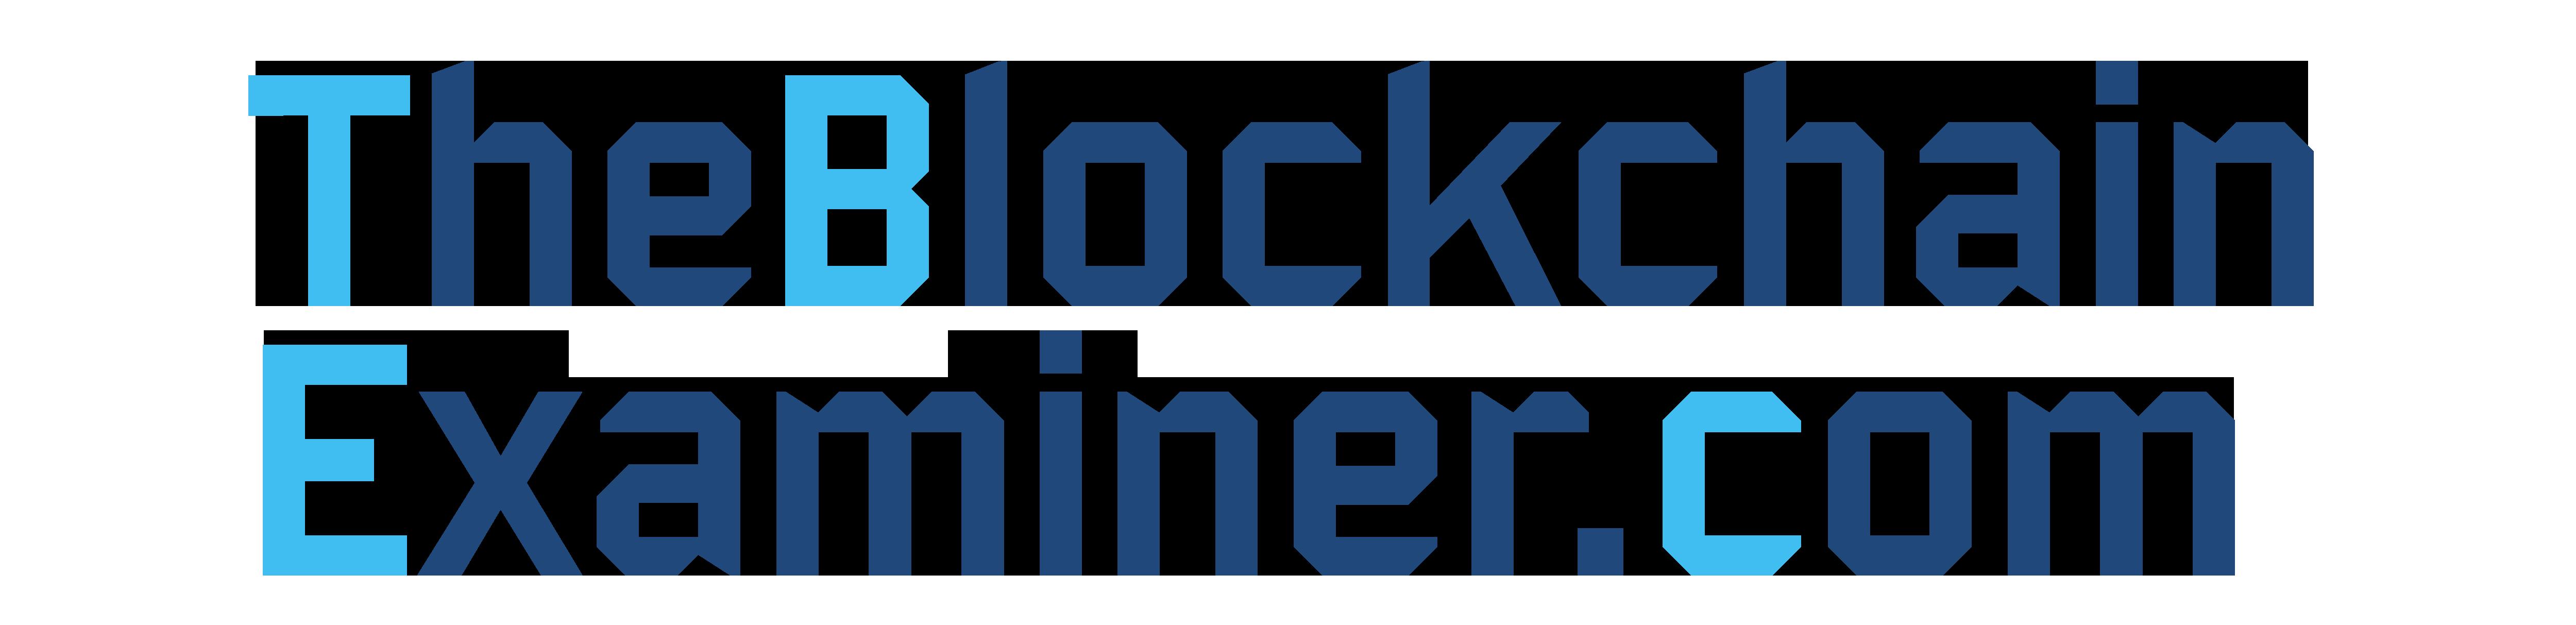 Theblockchainexaminer Logo